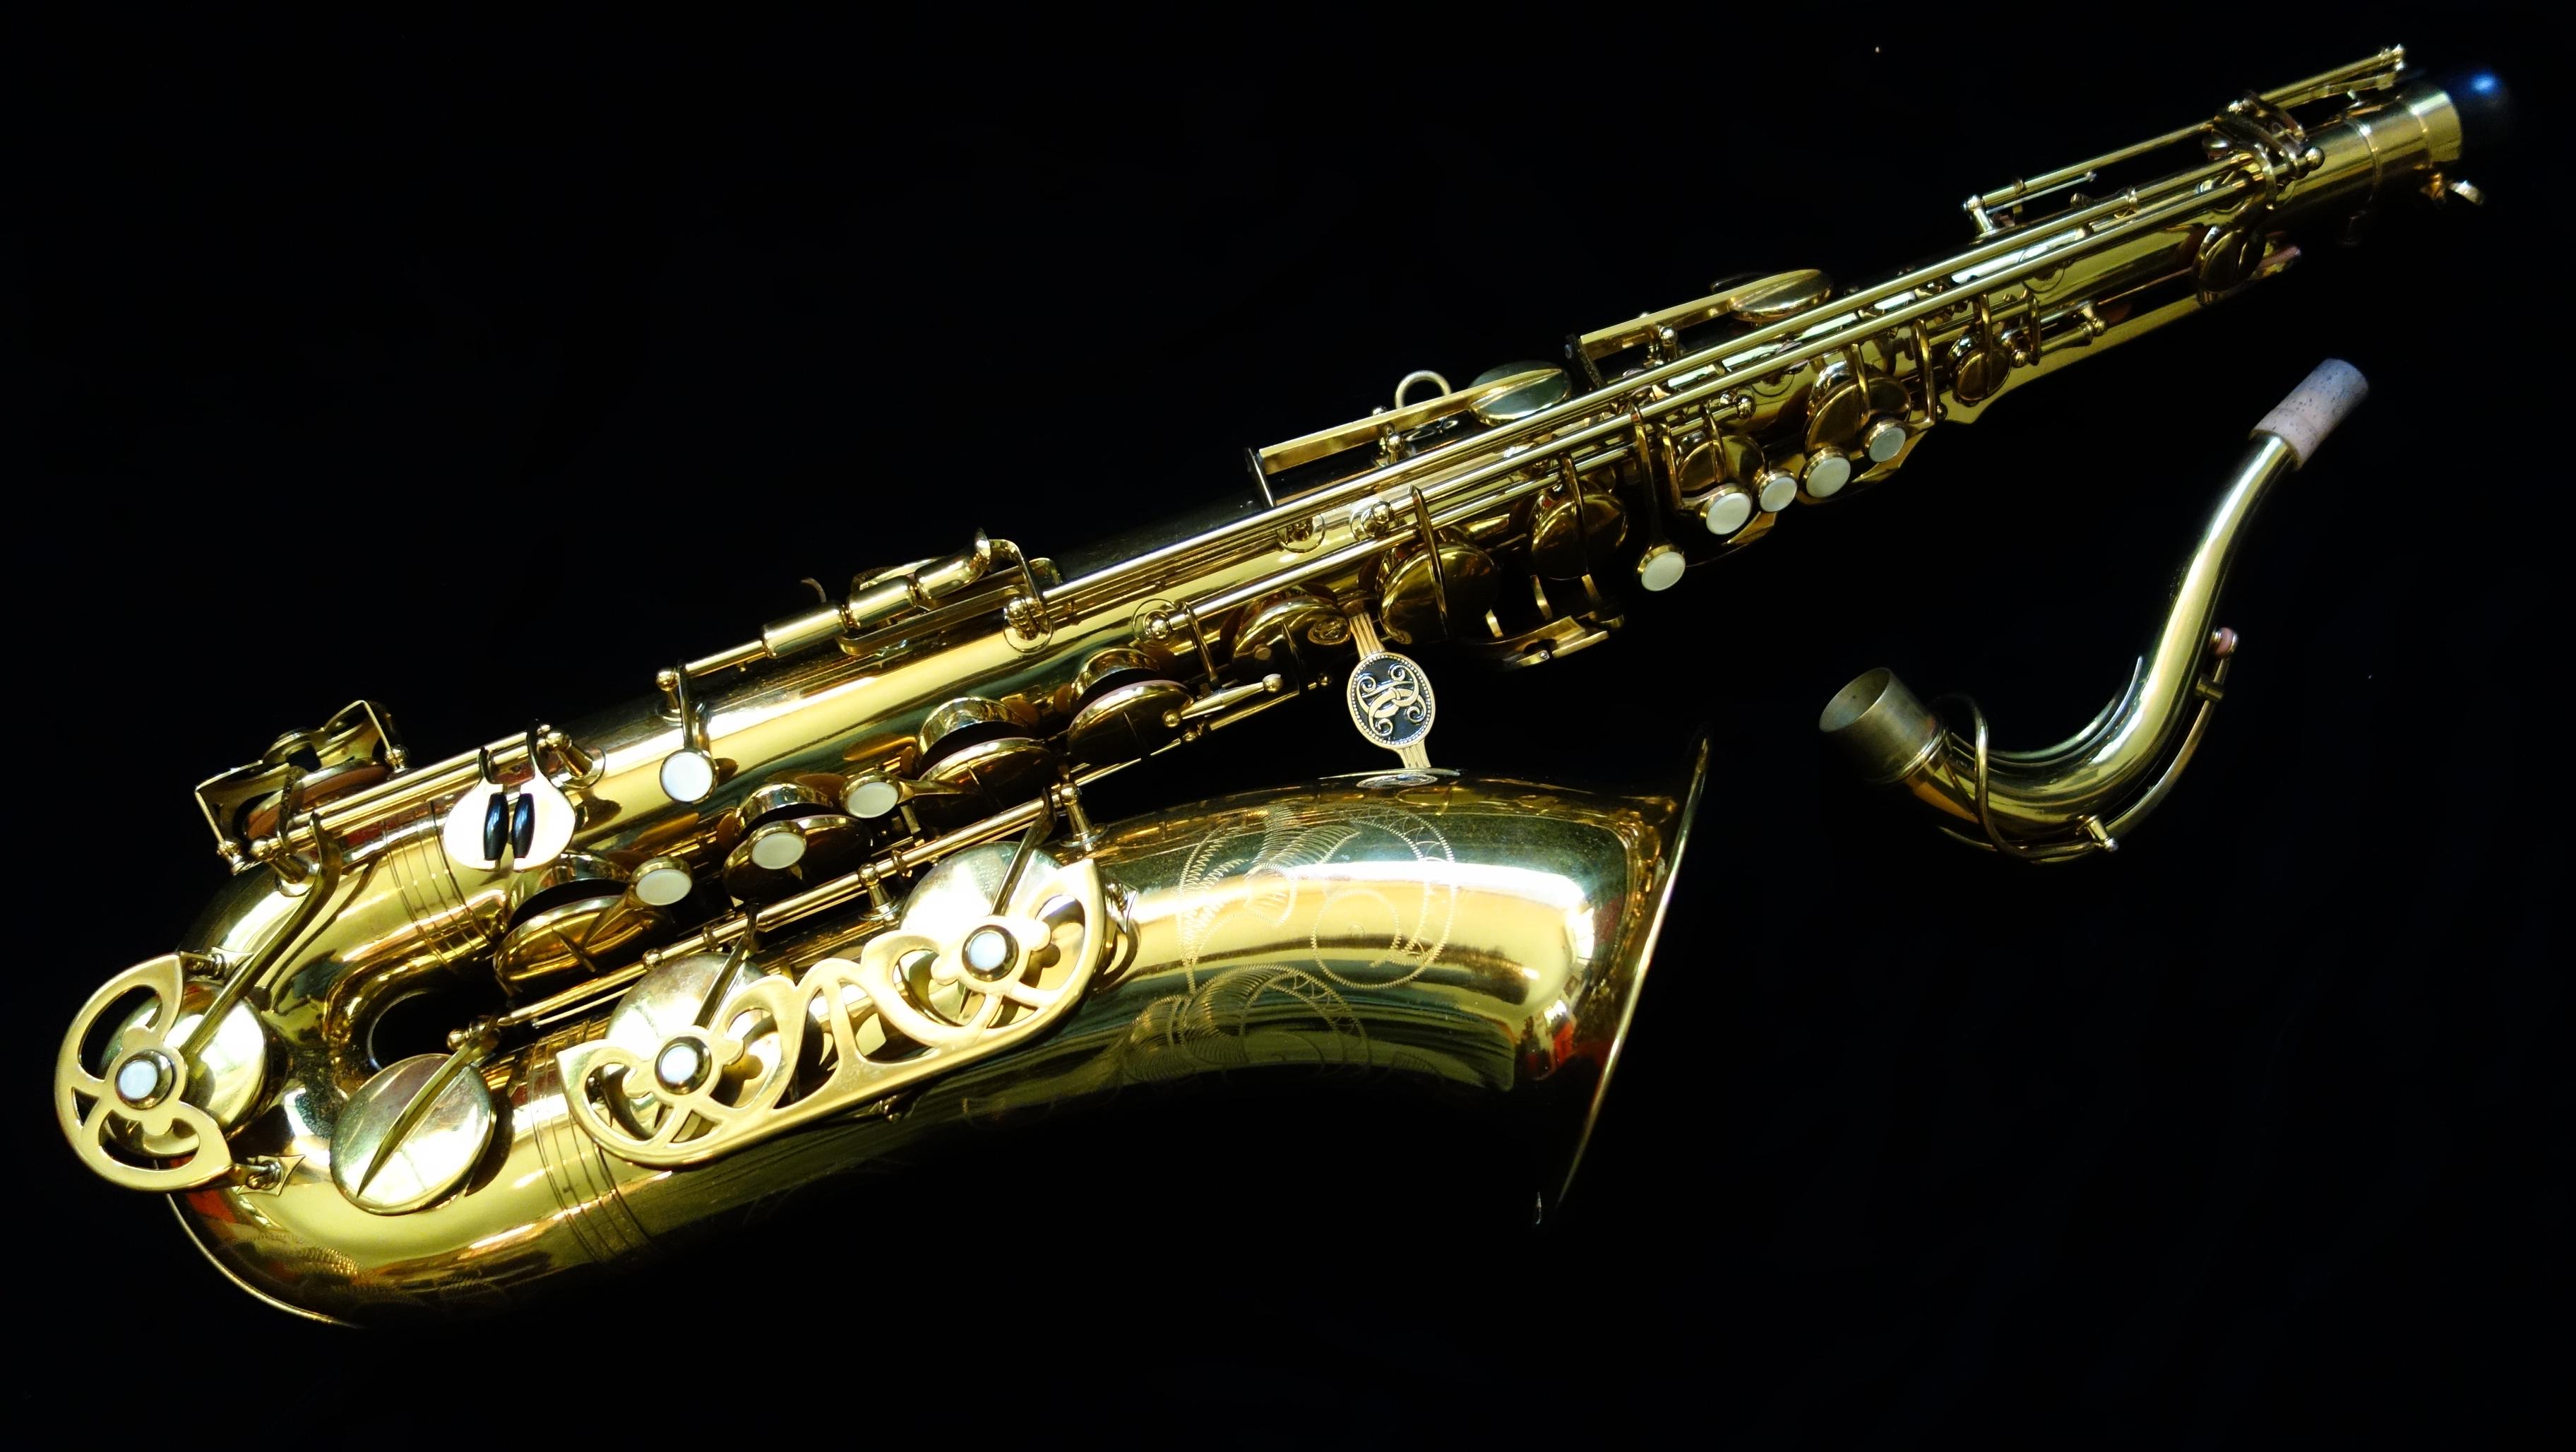 Sensational Buffet Super Dynaction Tenor Saxophone Museum Condition Interior Design Ideas Lukepblogthenellocom